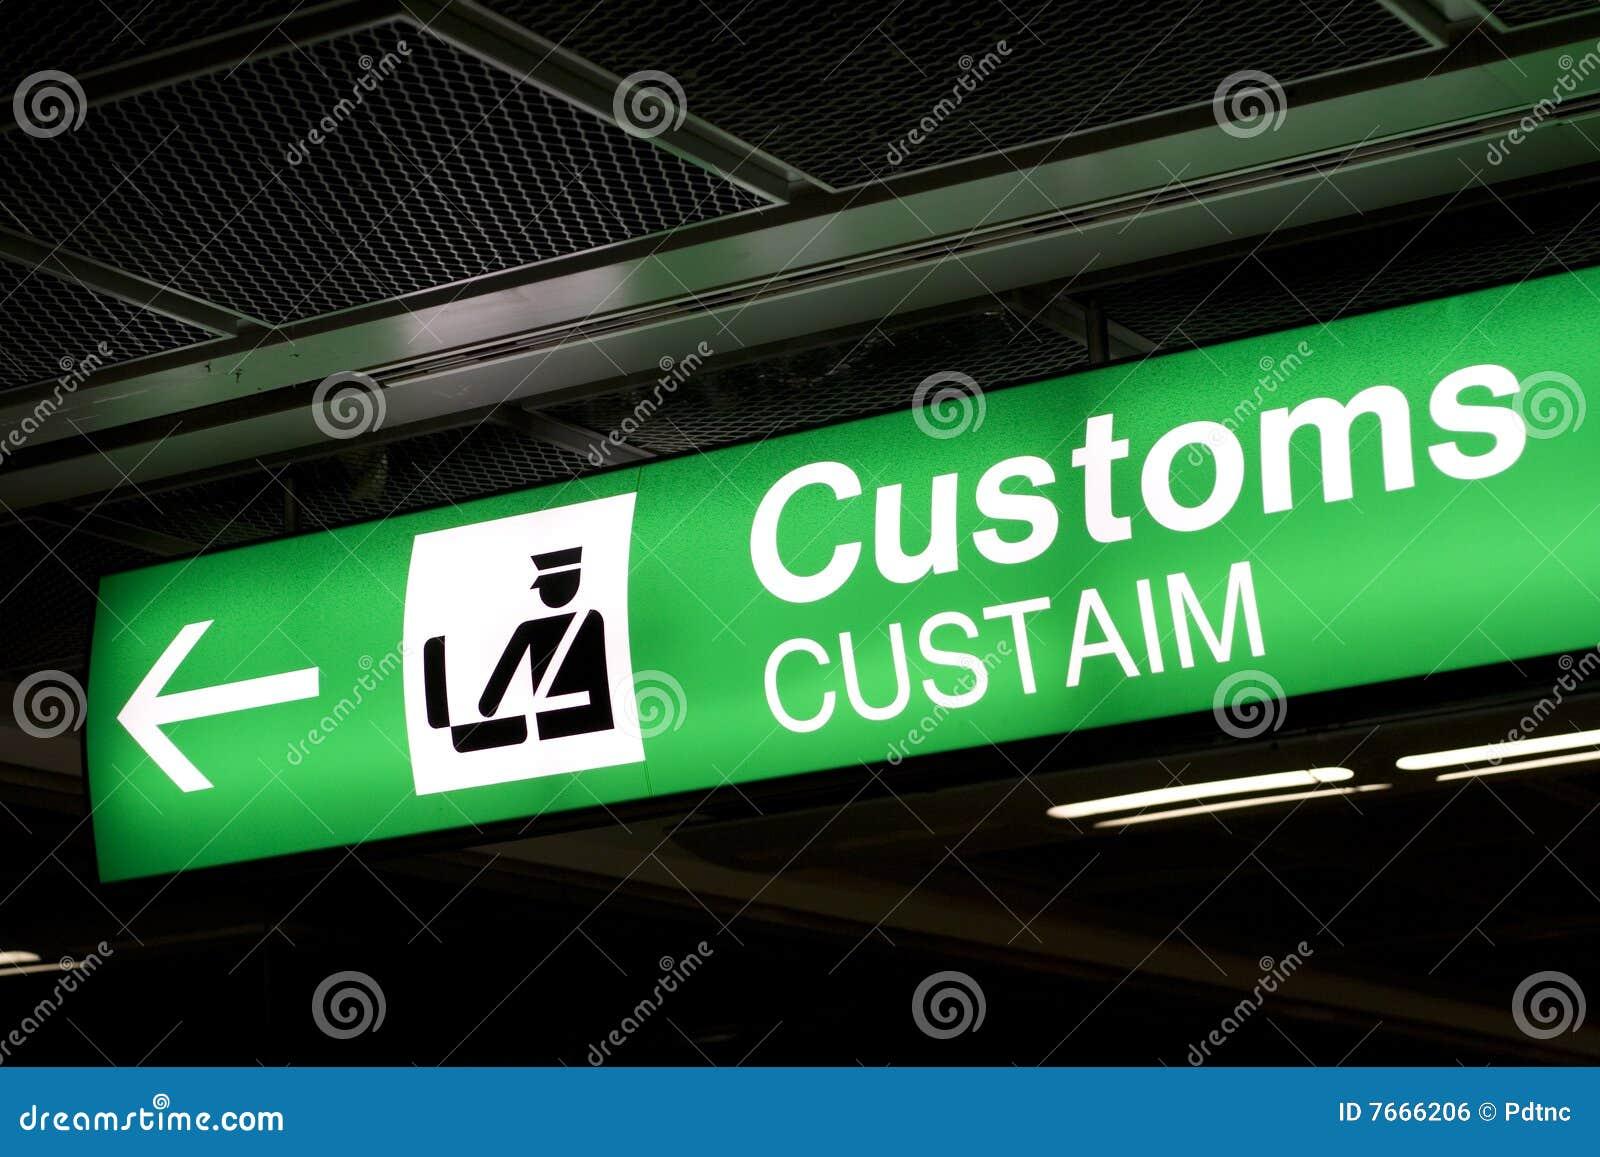 Clip Art of Customs customs - Search Clipart, Illustration ...